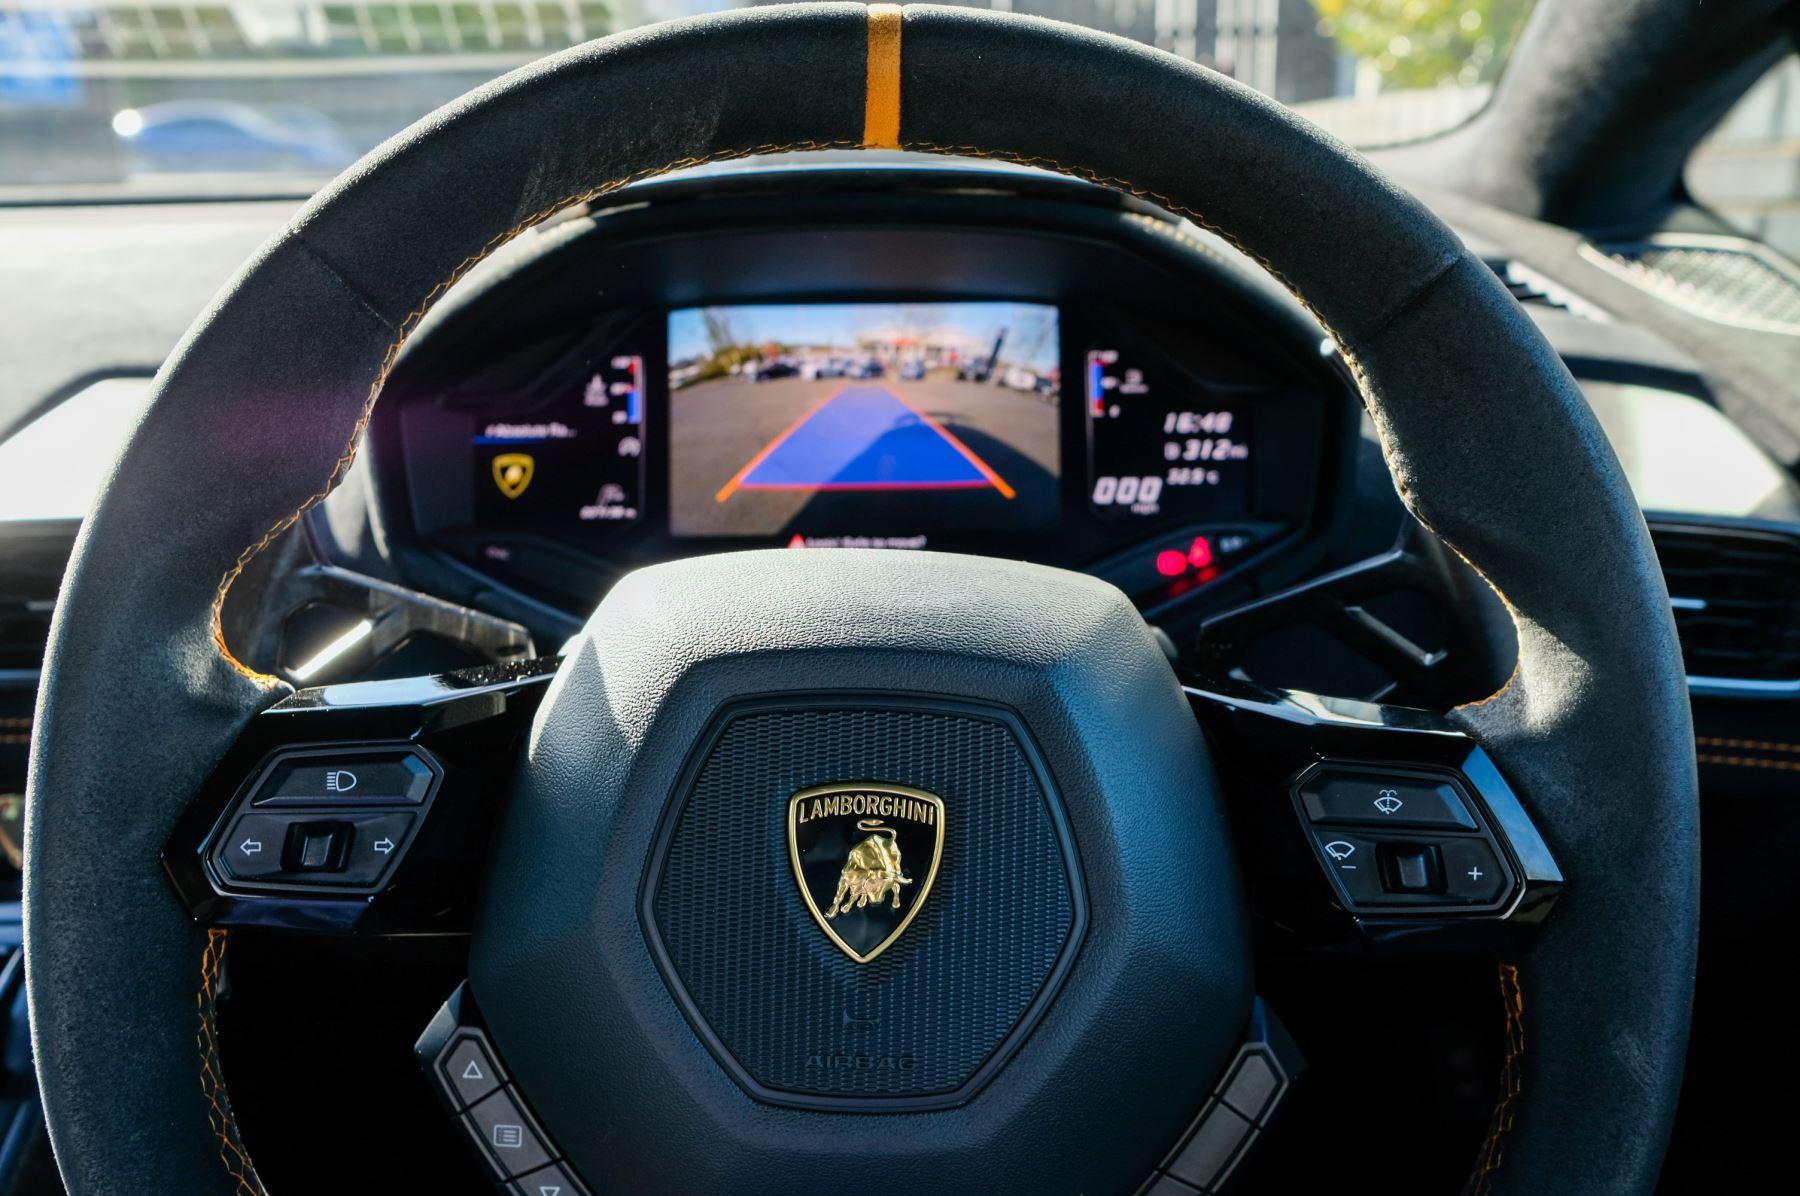 Lamborghini Huracan Performante LP 640-4 2dr LDF - Carbon Ceramic Brakes - Carbon Fiber Features - Comfort Seats image 22